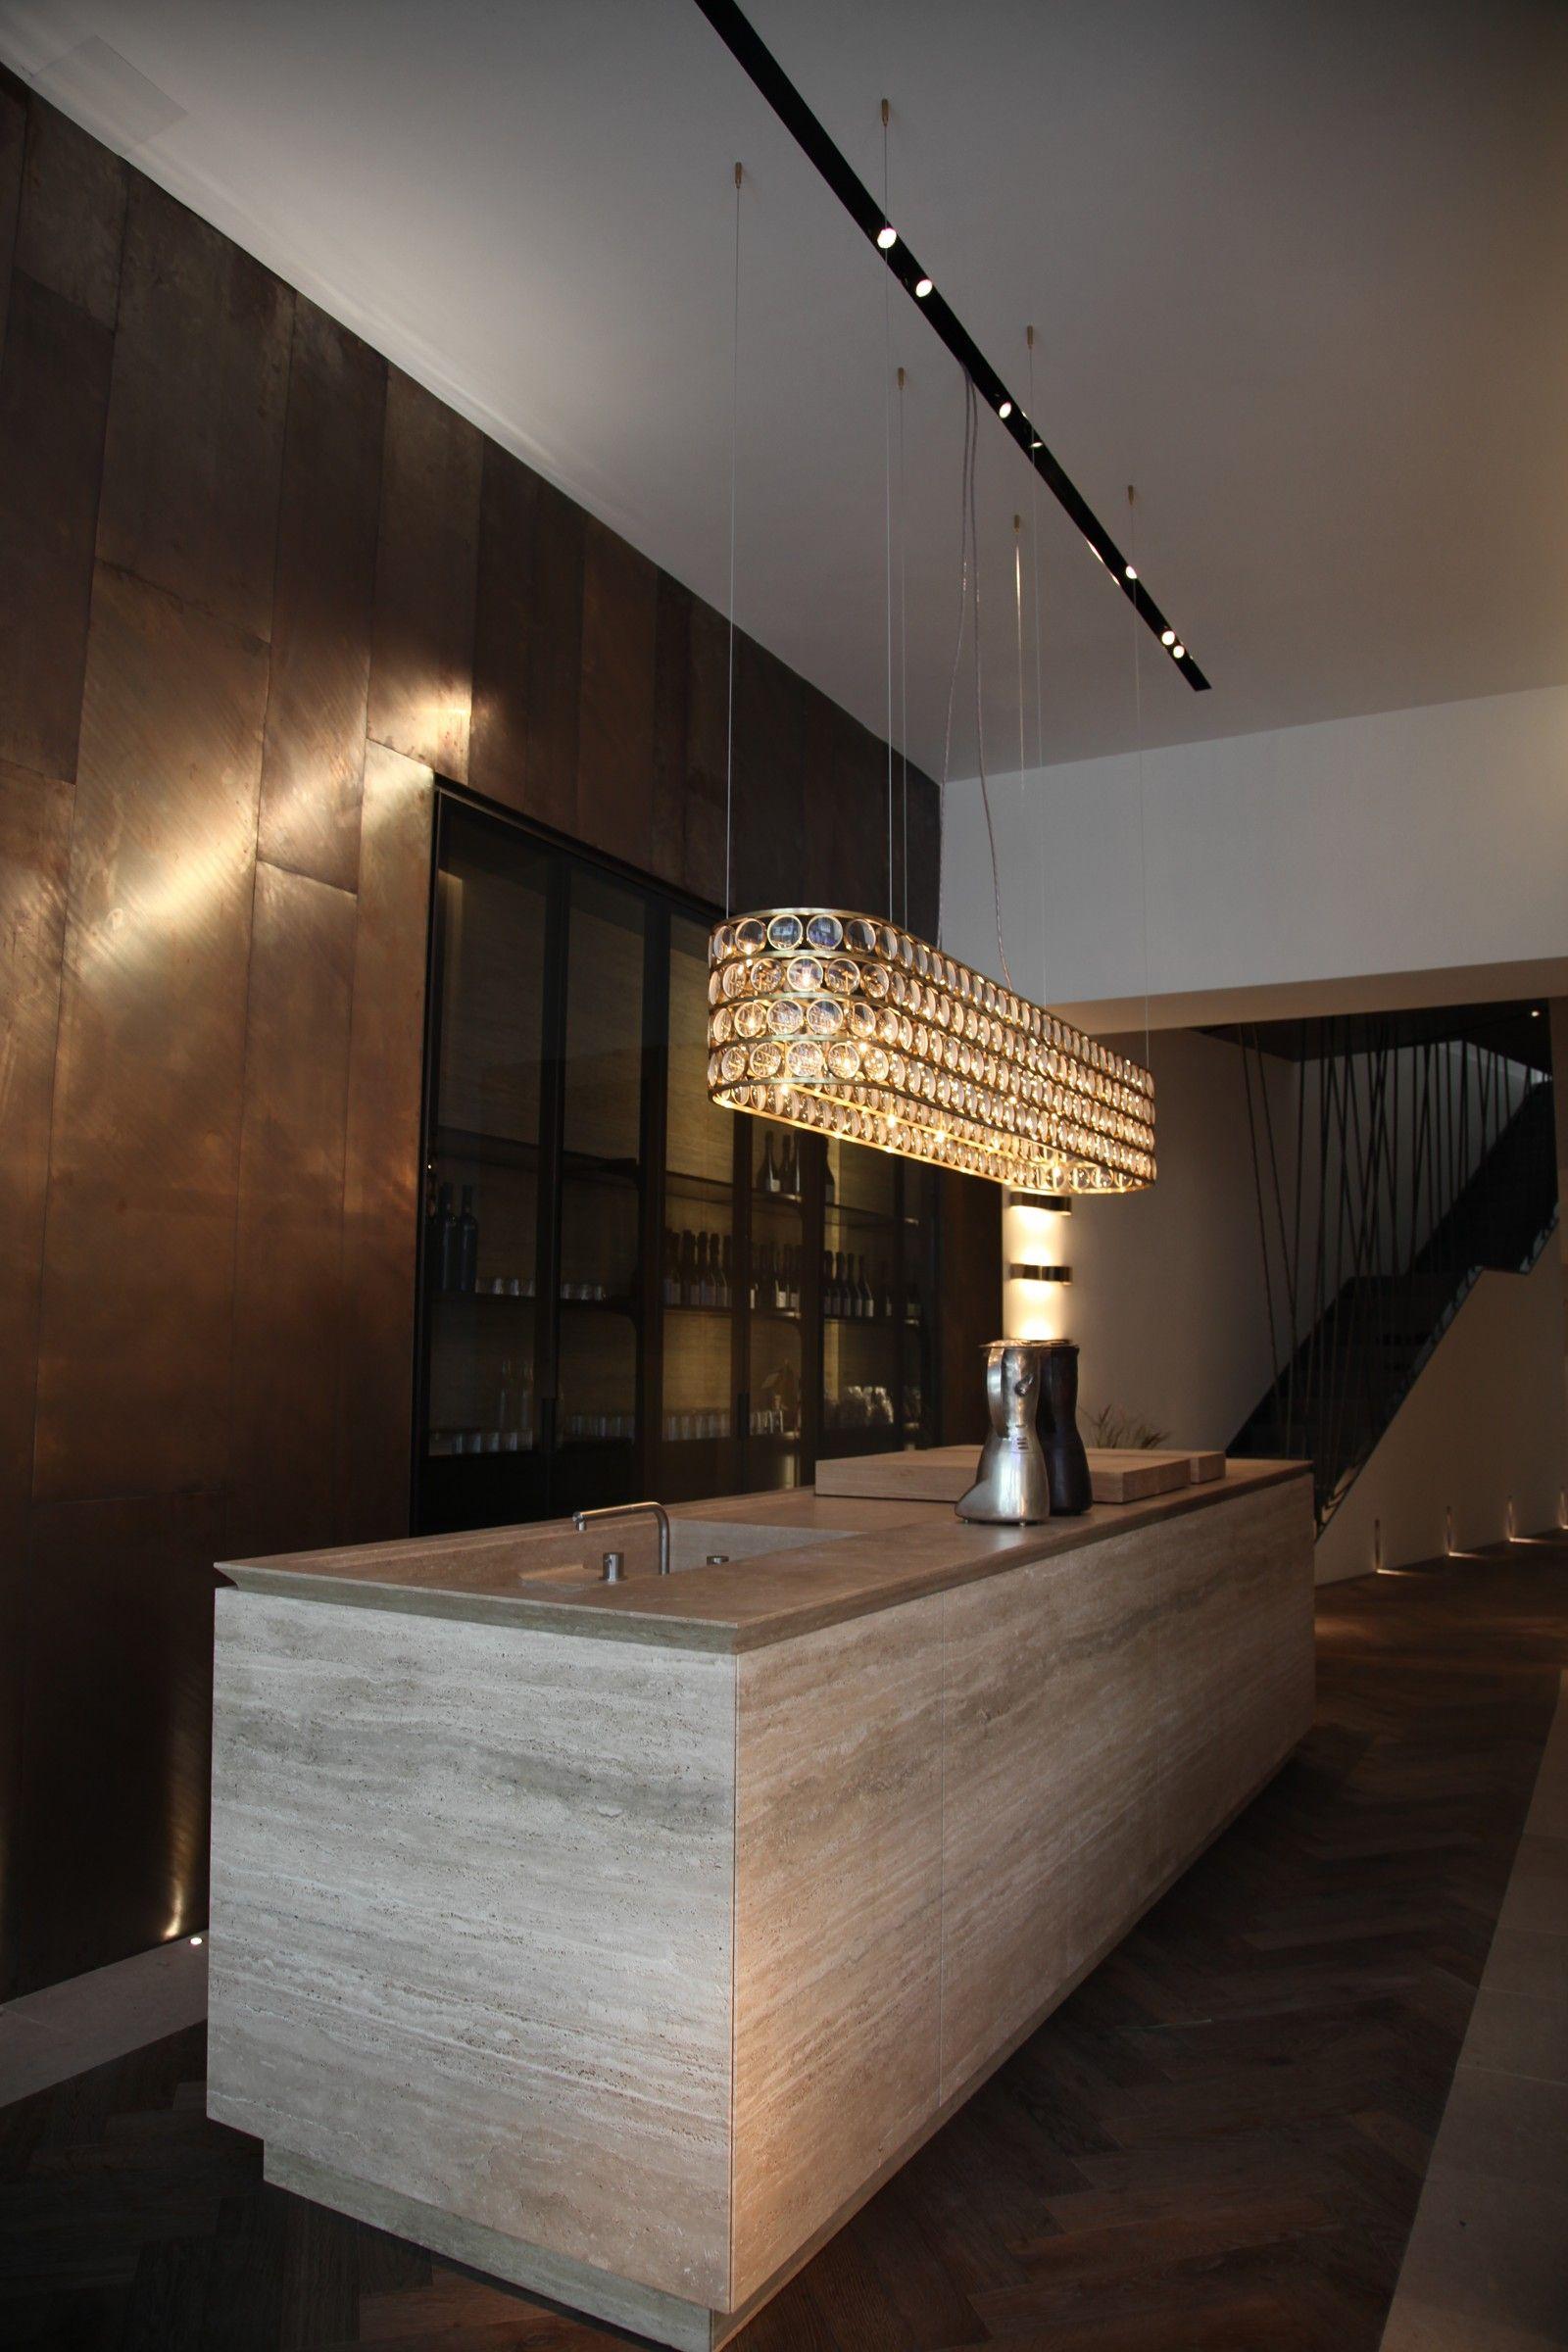 BJARNHOFF STUDIO - Bredgade 23 - KBH Vaselli Kitchen#Viabizzuno#Rimadesio  lighting ...